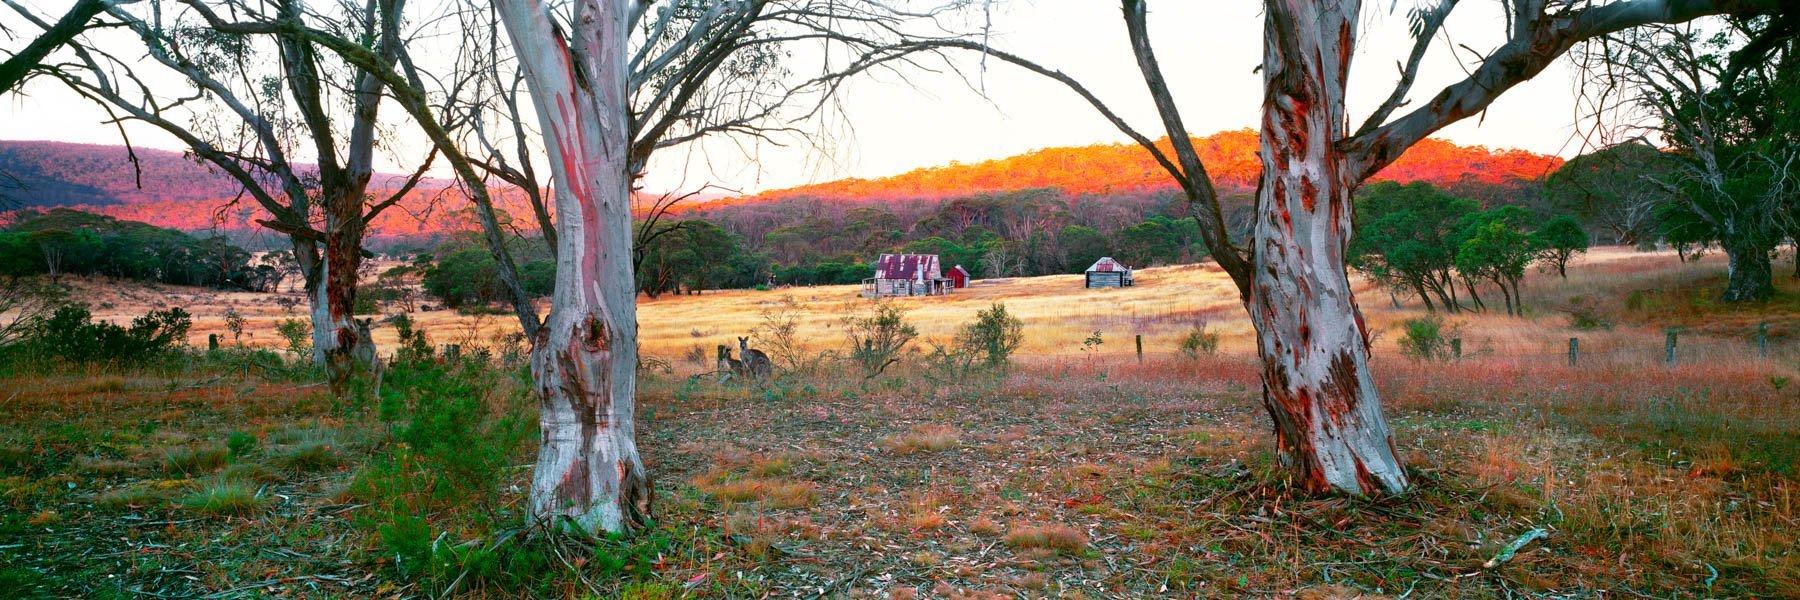 Kangaroos grazing near historic Coolamine Homstead, Kosciuszko National Park, NSW, Australia.